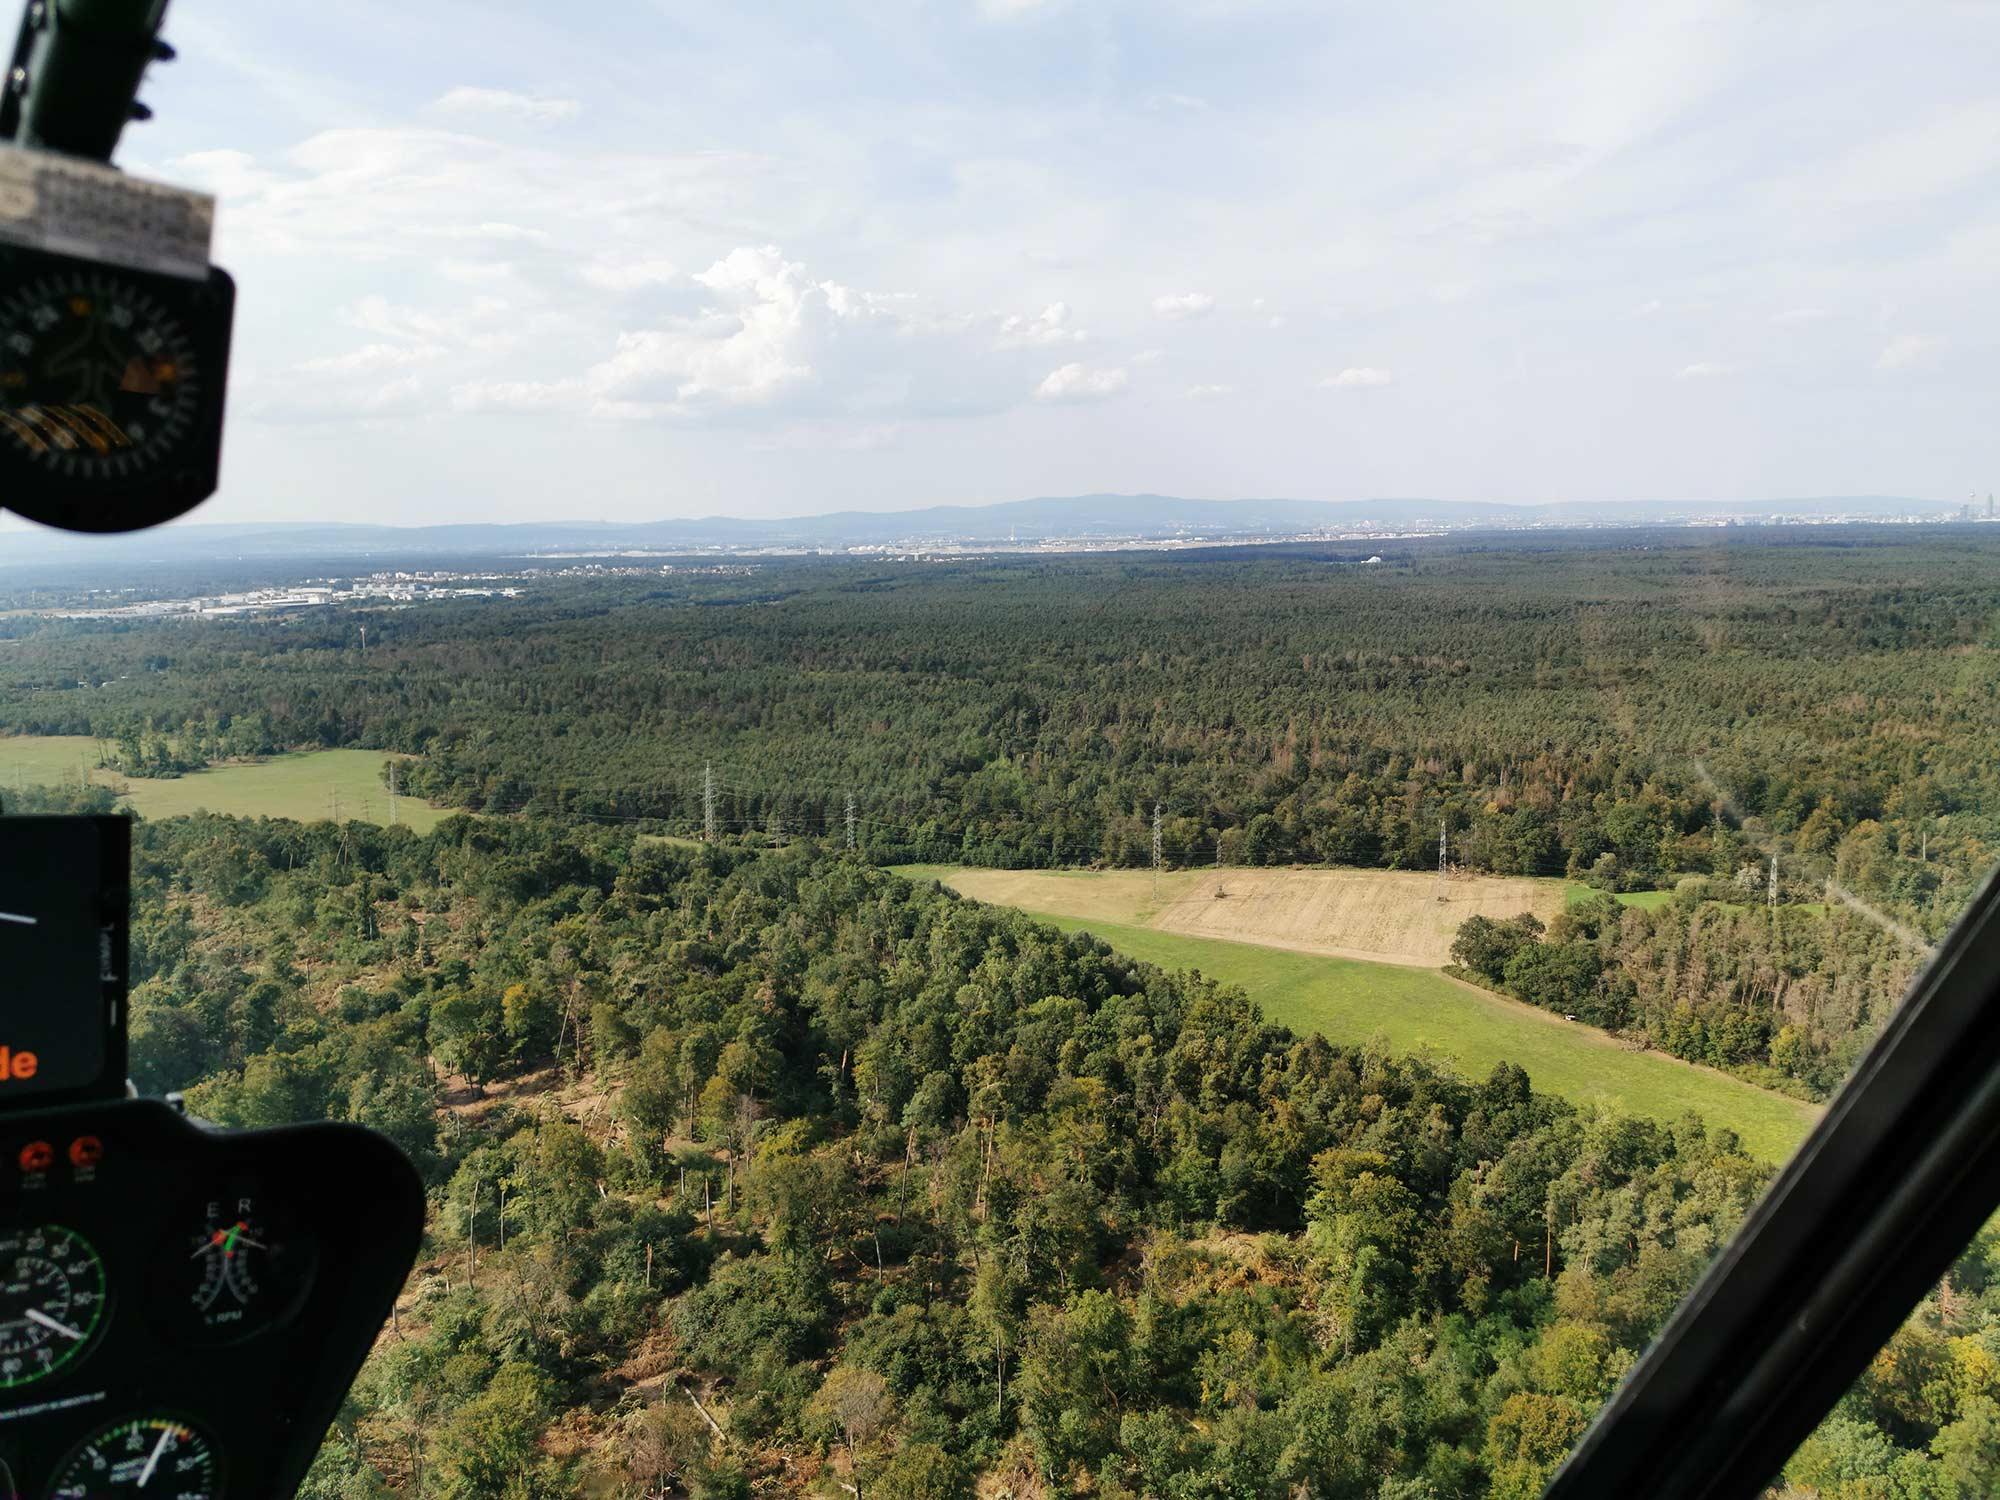 Frankfurt greenbelt - trees - forest - nature - RheinMain - aerial tour